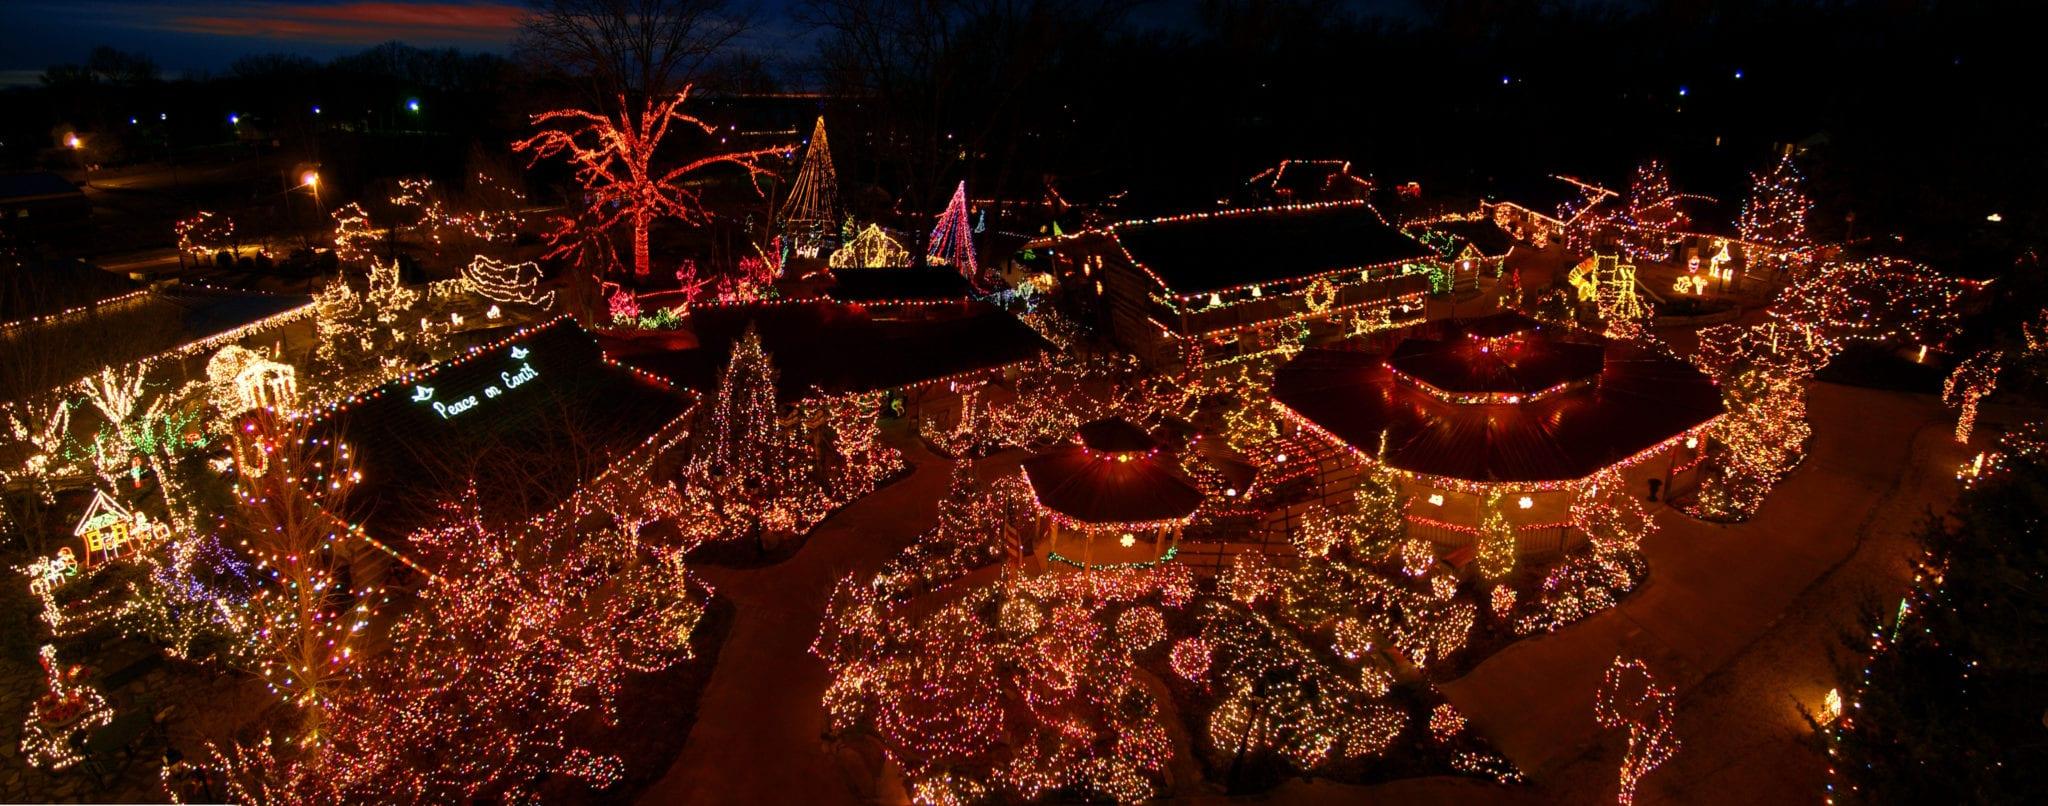 Patti\'s Christmas Lights - Specialistsinpaincare